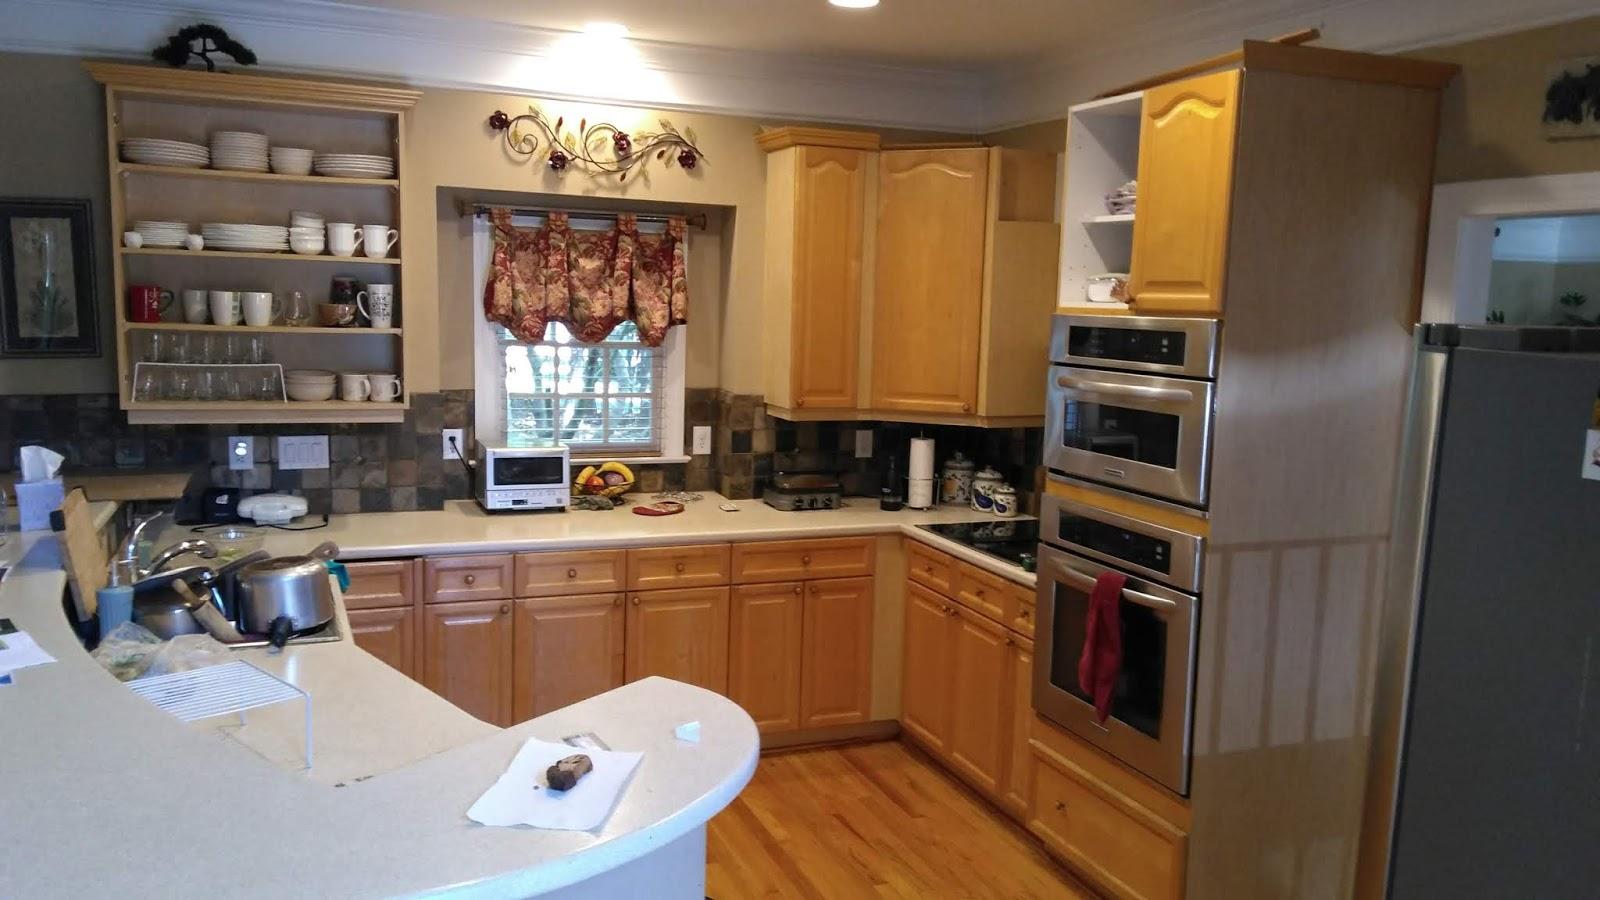 Bob S Kitchen Cabinet Refacing Serving Charlotte Nc Area